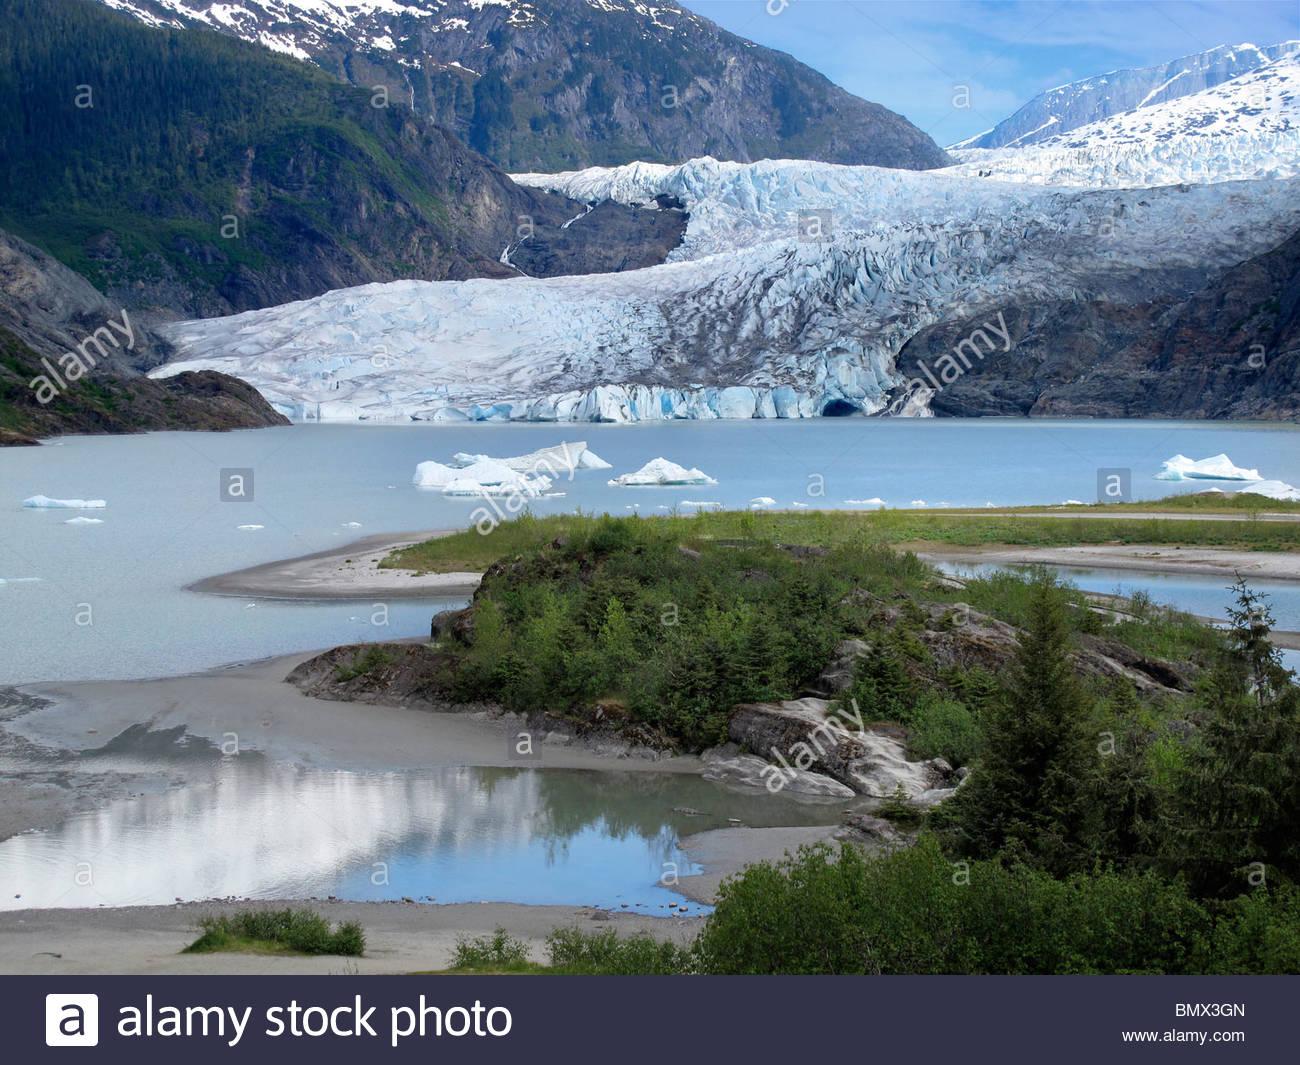 Mendenhall Glacier, Alaska - Stock Image